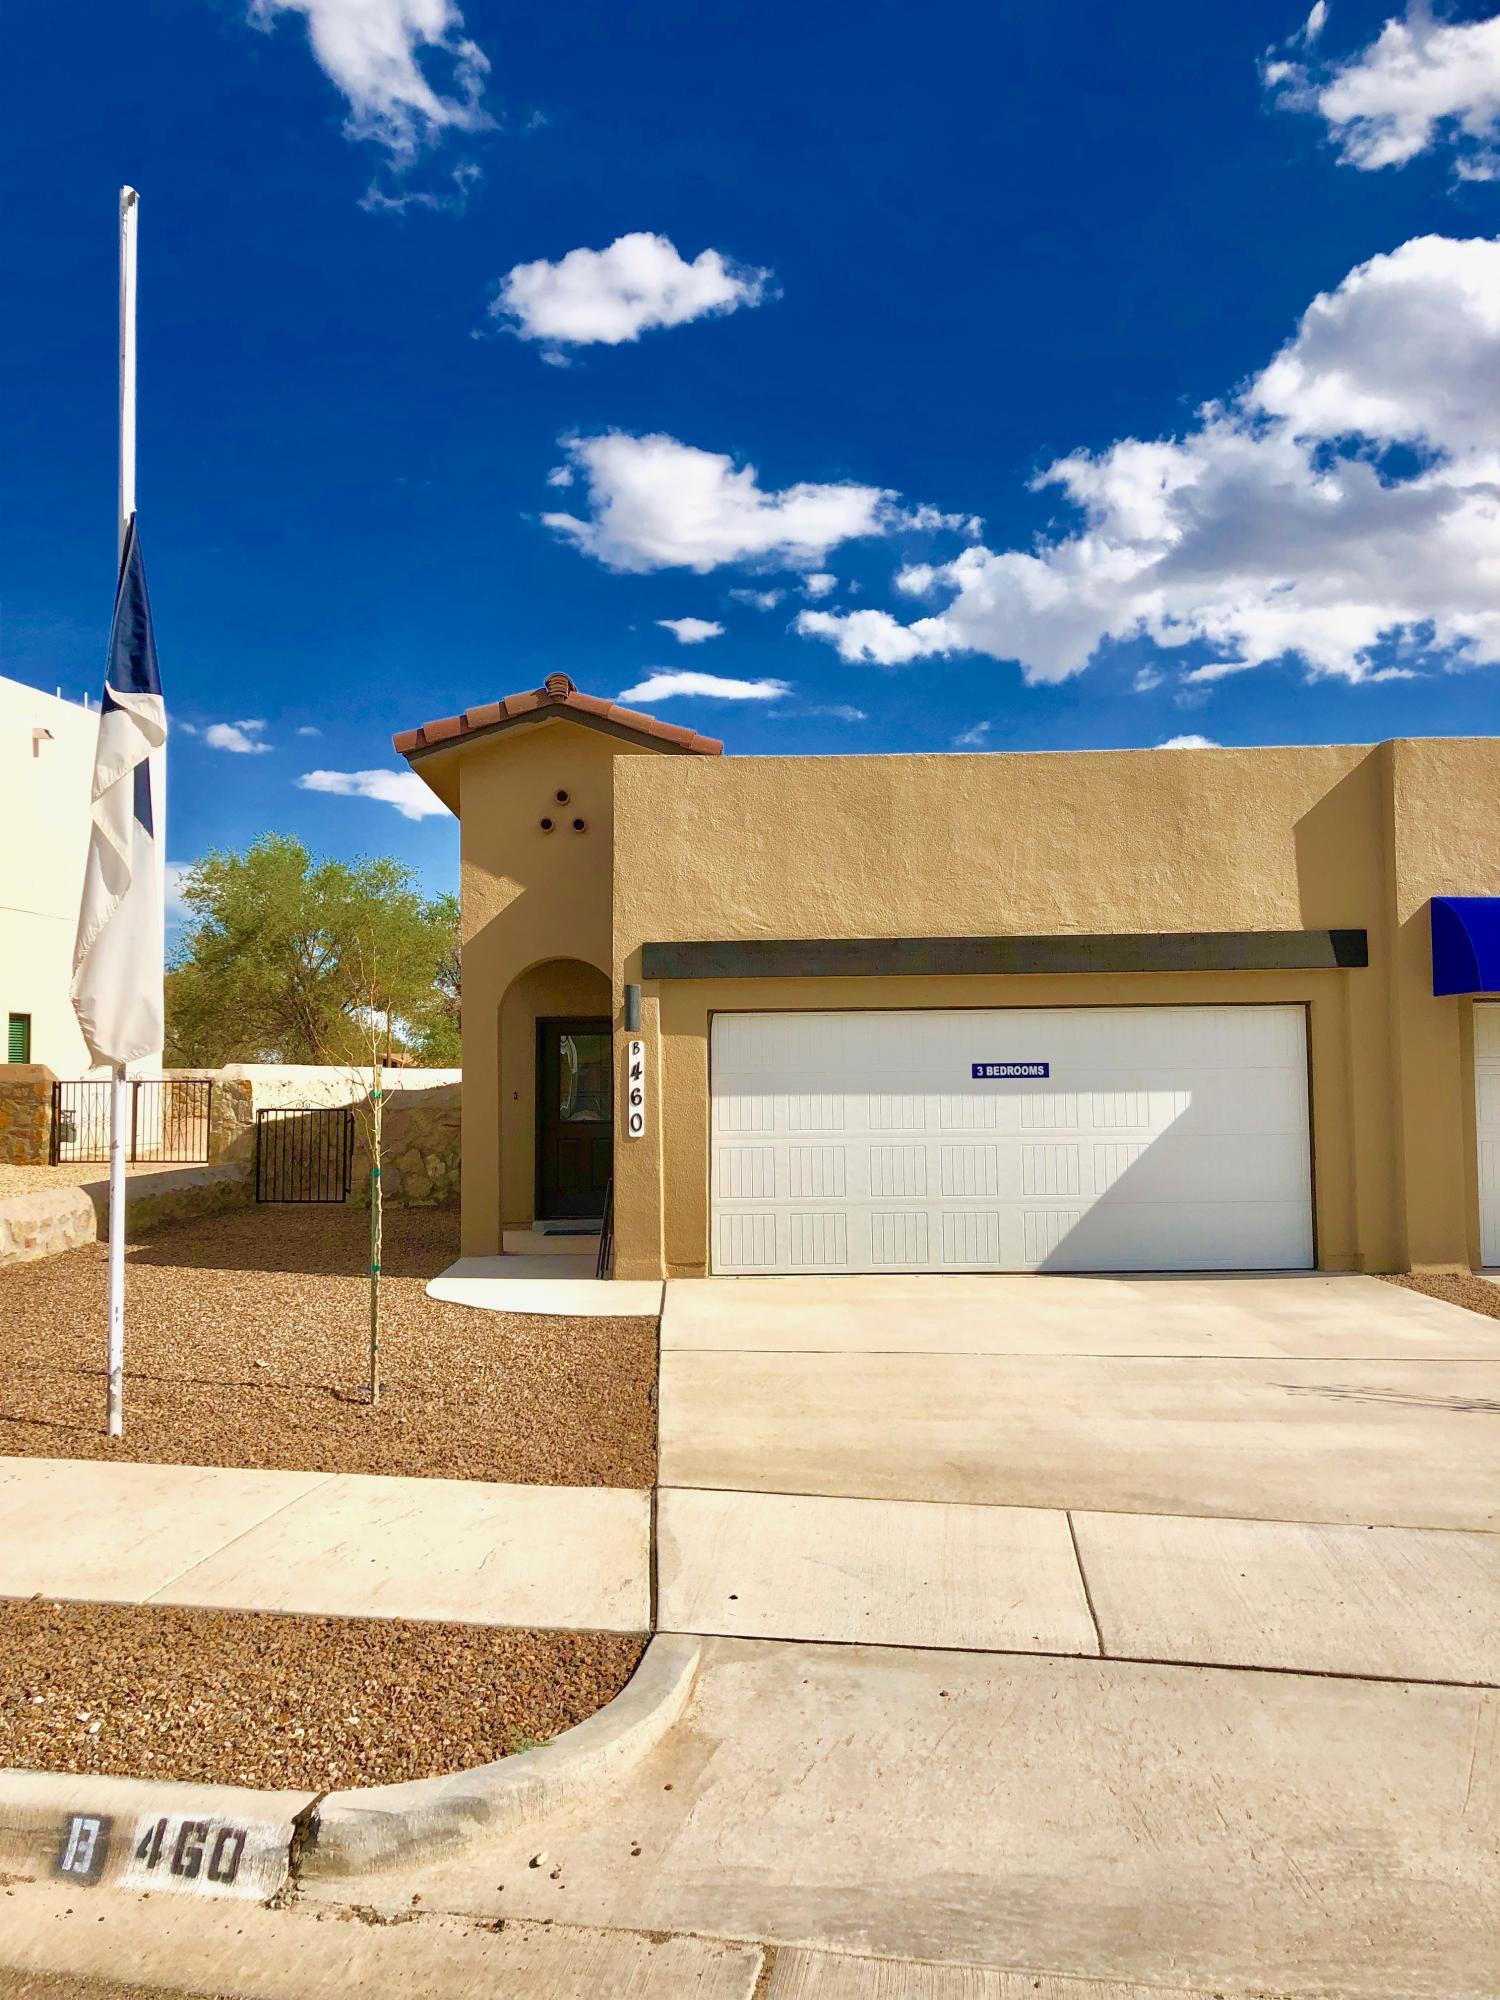 804 HC GILBERT MINJARES, Socorro, Texas 79927, 3 Bedrooms Bedrooms, ,2 BathroomsBathrooms,Residential,For sale,HC GILBERT MINJARES,815522